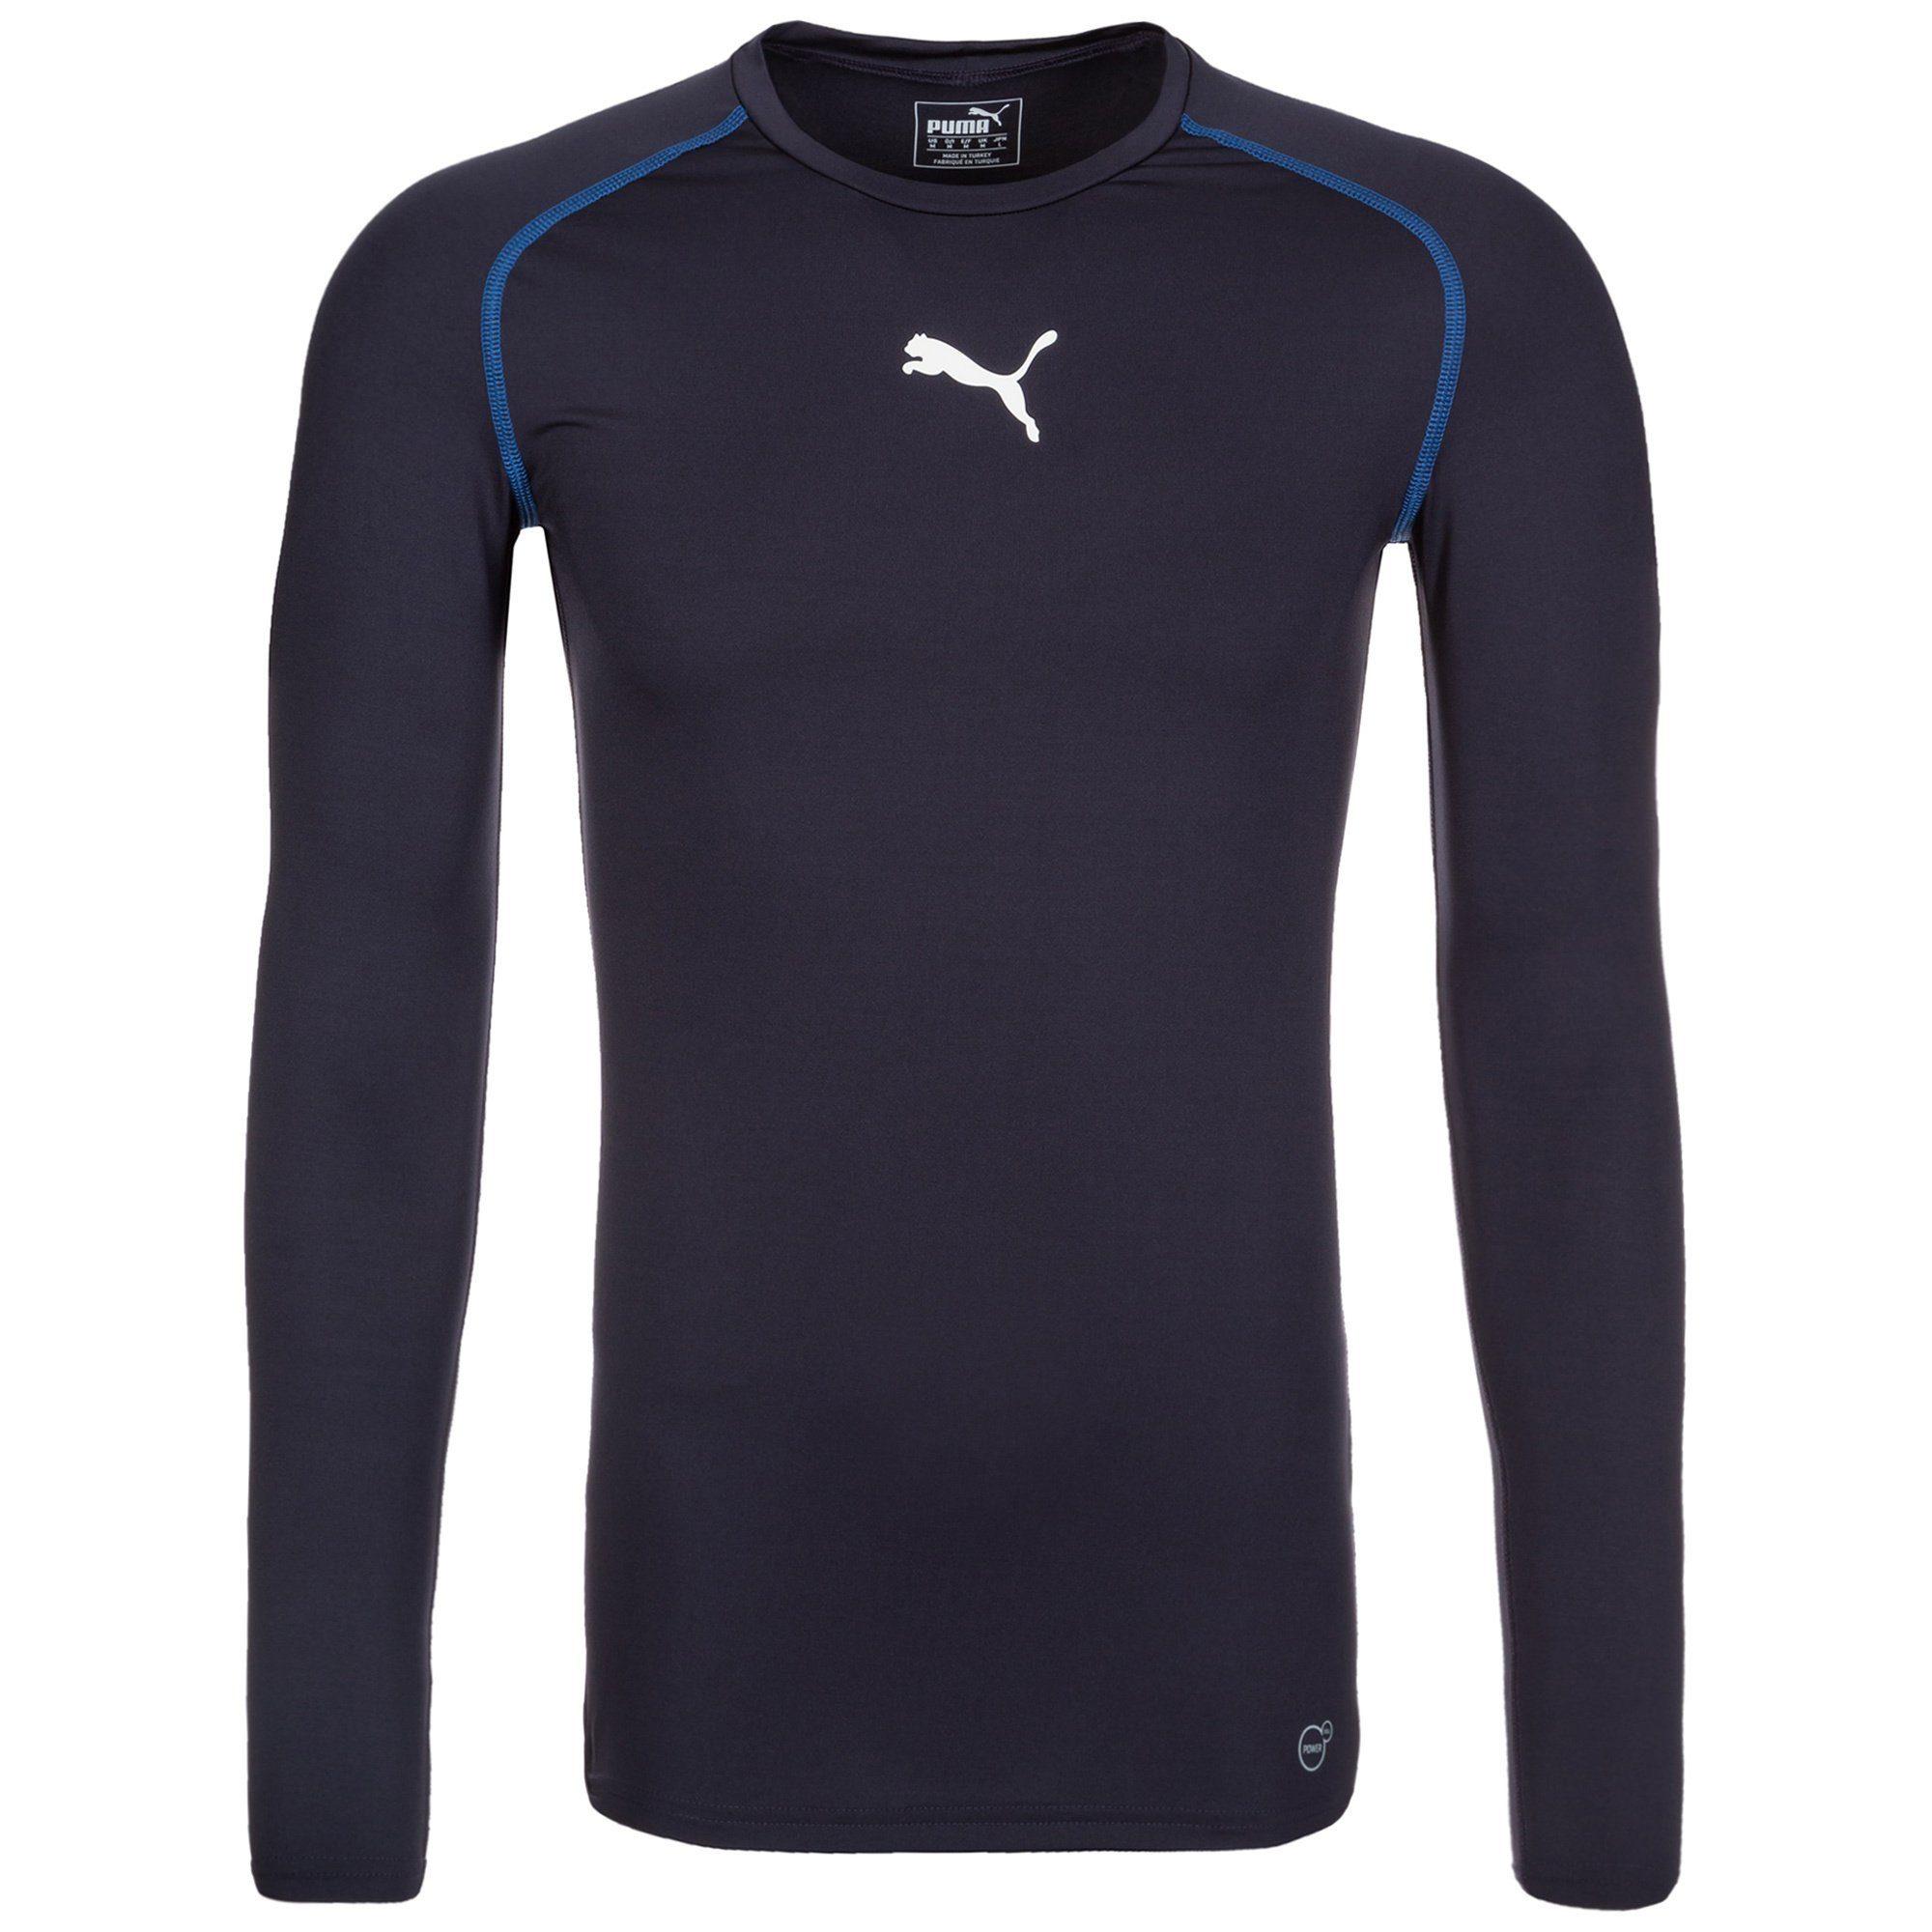 PUMA TB Trainingsshirt Herren | Sportbekleidung > Sportshirts > Funktionsshirts | Blau | Polyester - Elasthan | Puma